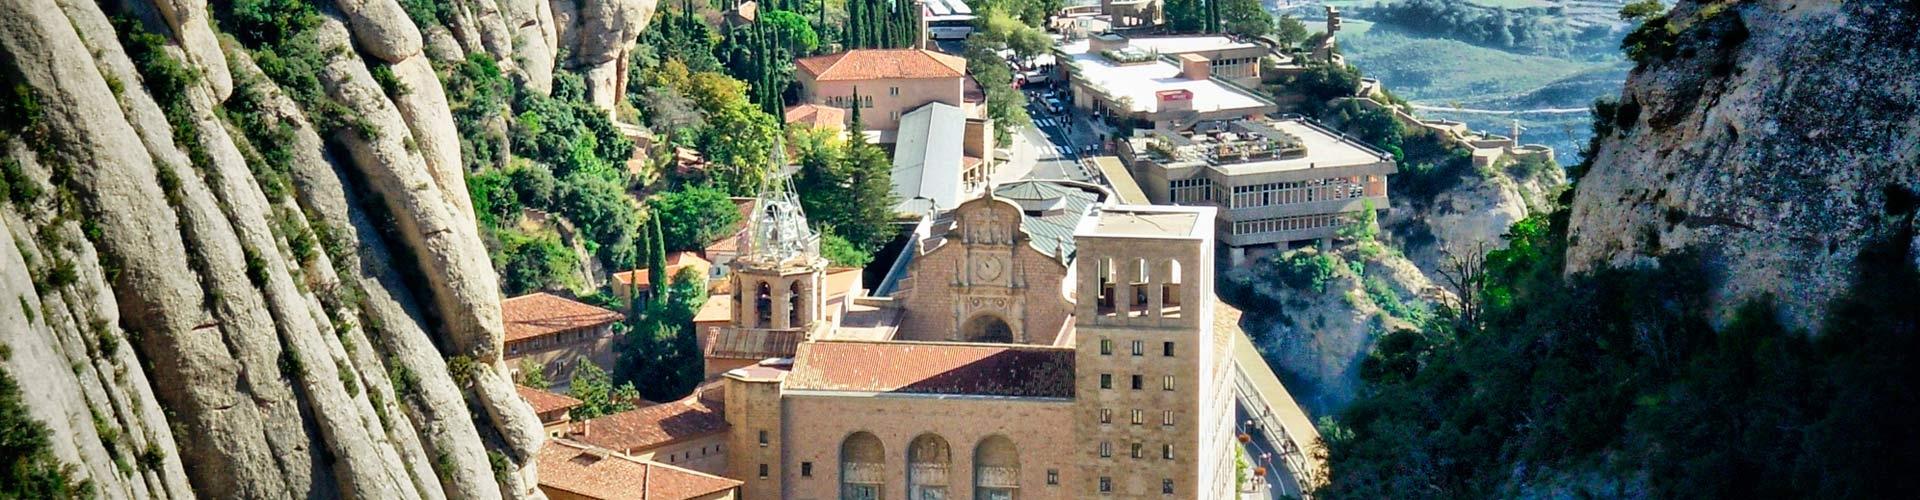 Visita Montserrat